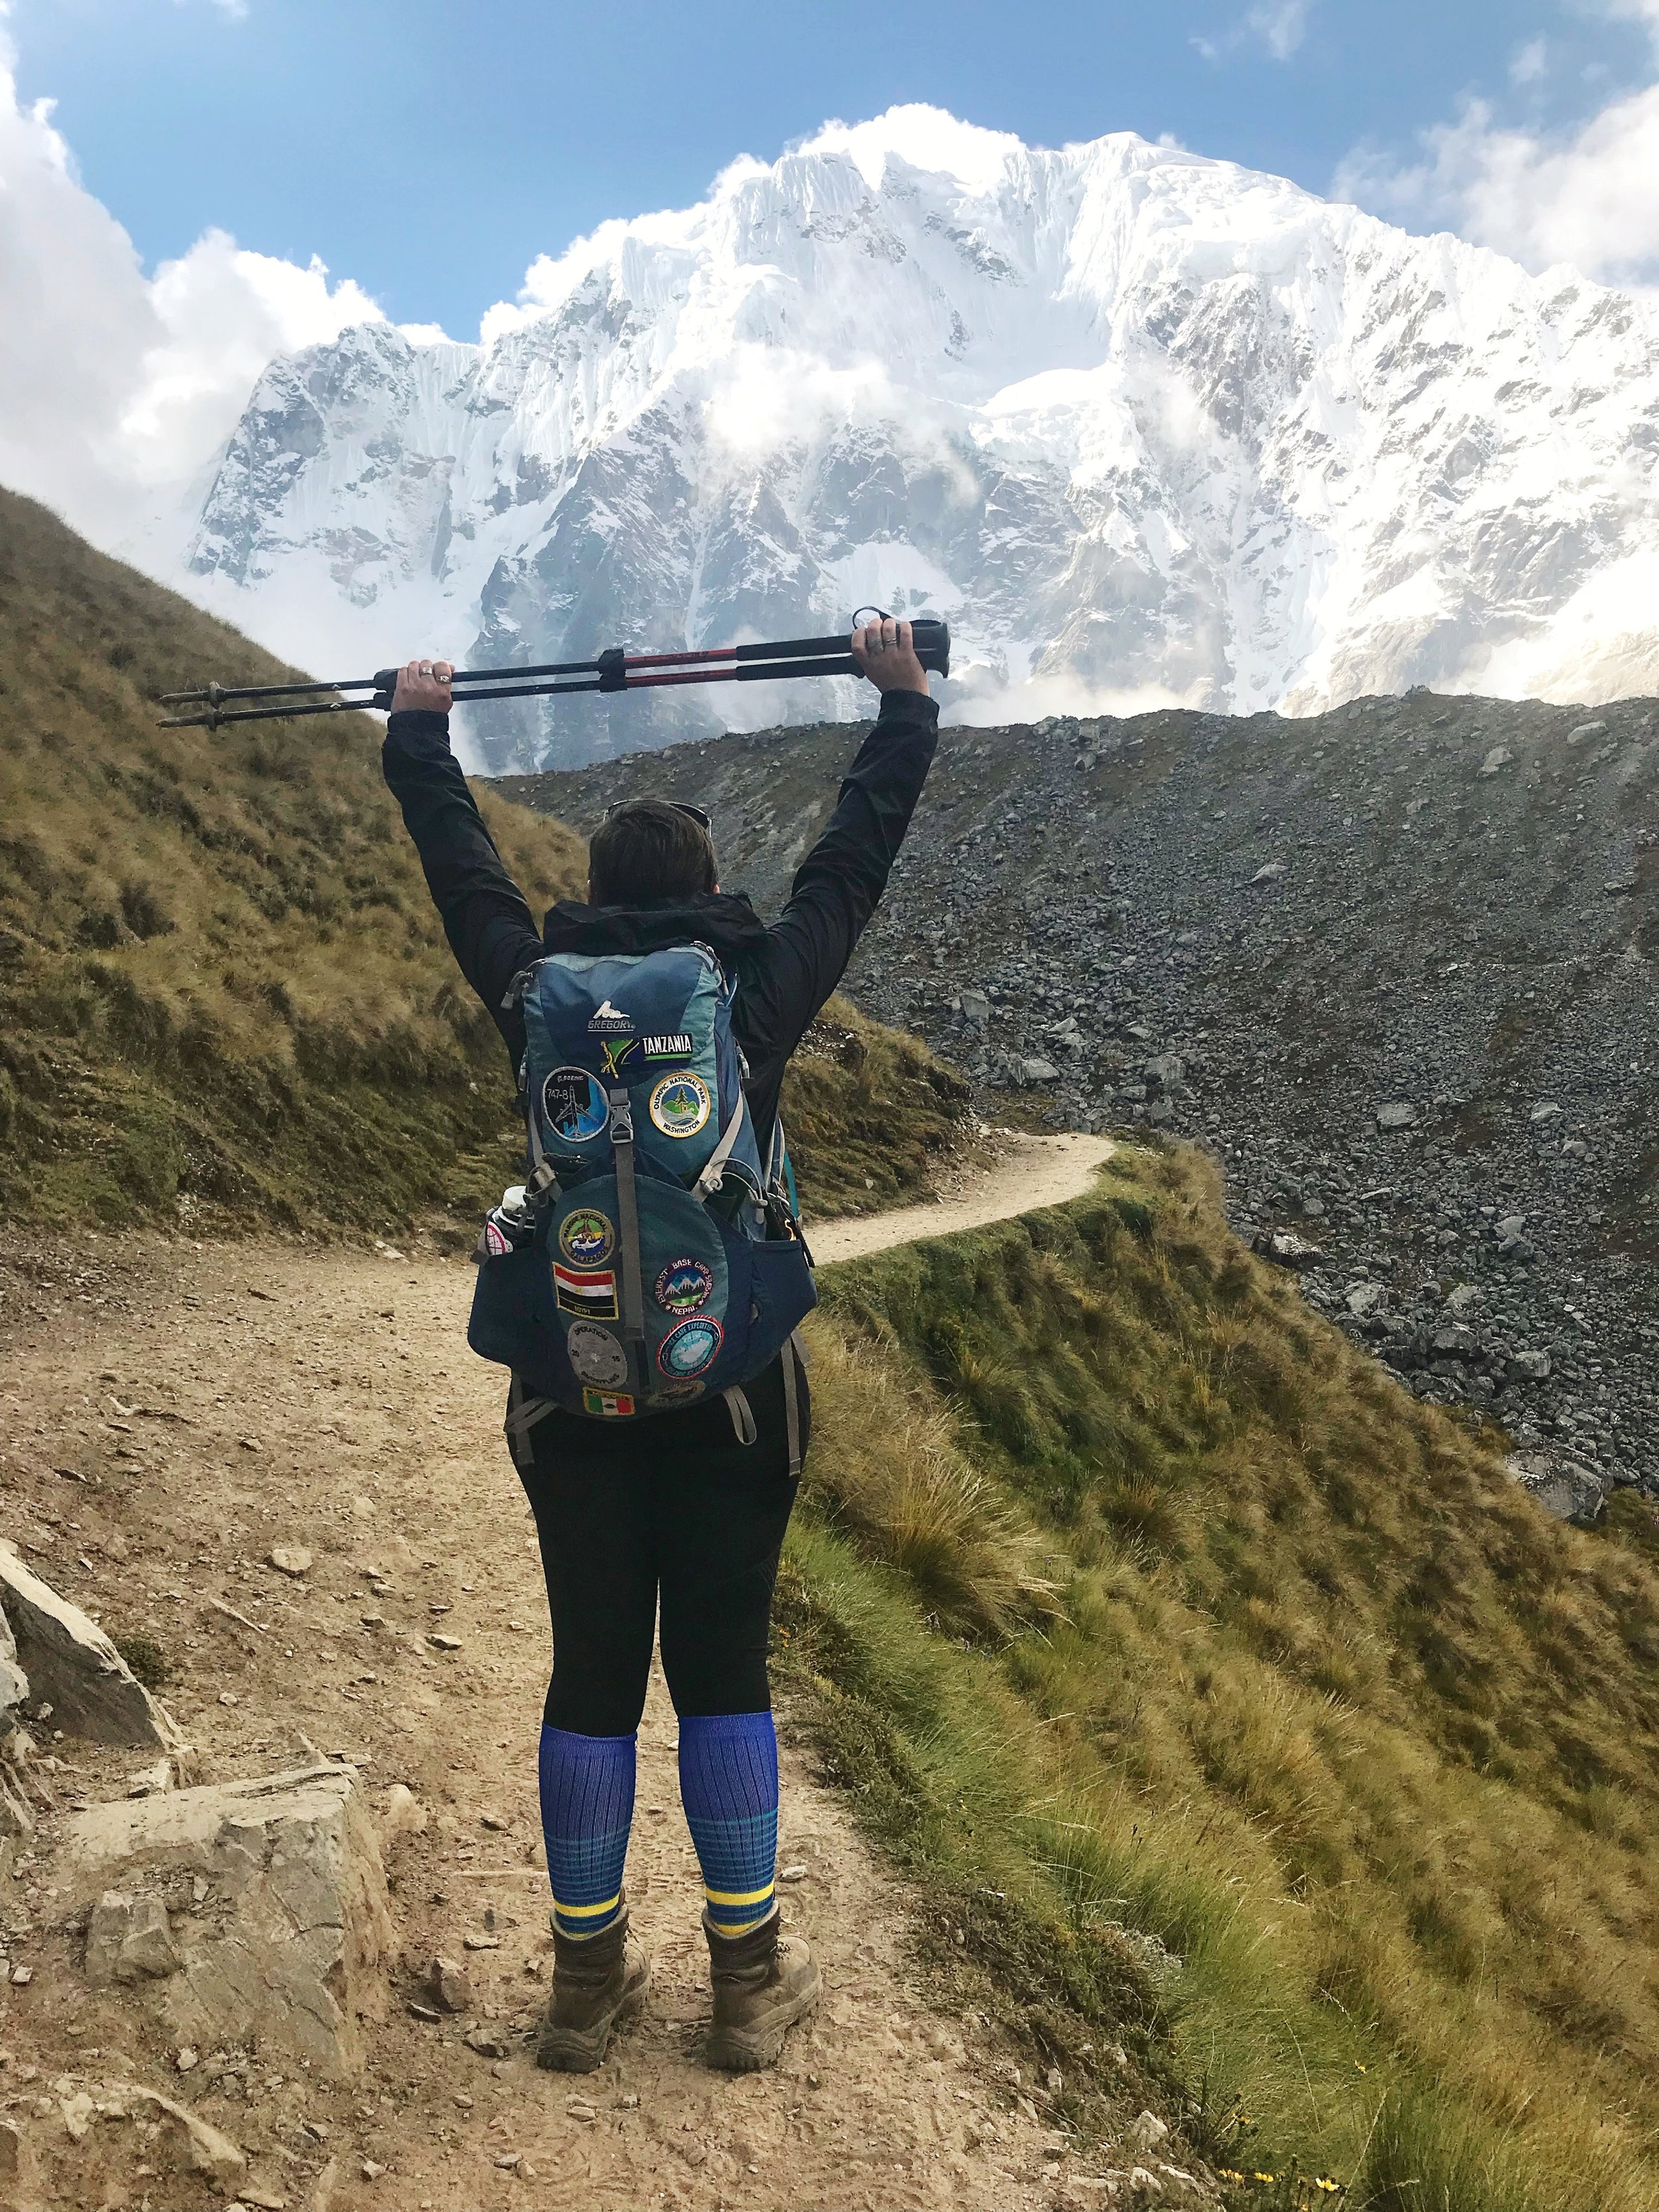 Photos that'll make you want to hike the Salkantay Trek